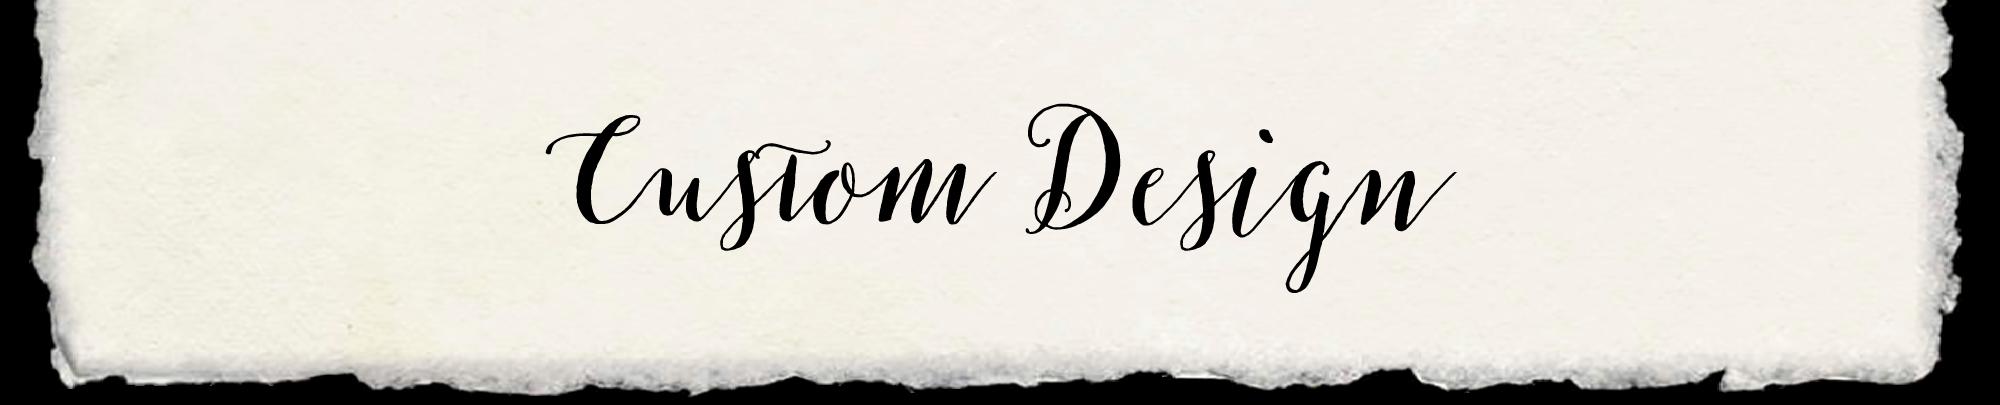 DBD-Website-CustomWide.png